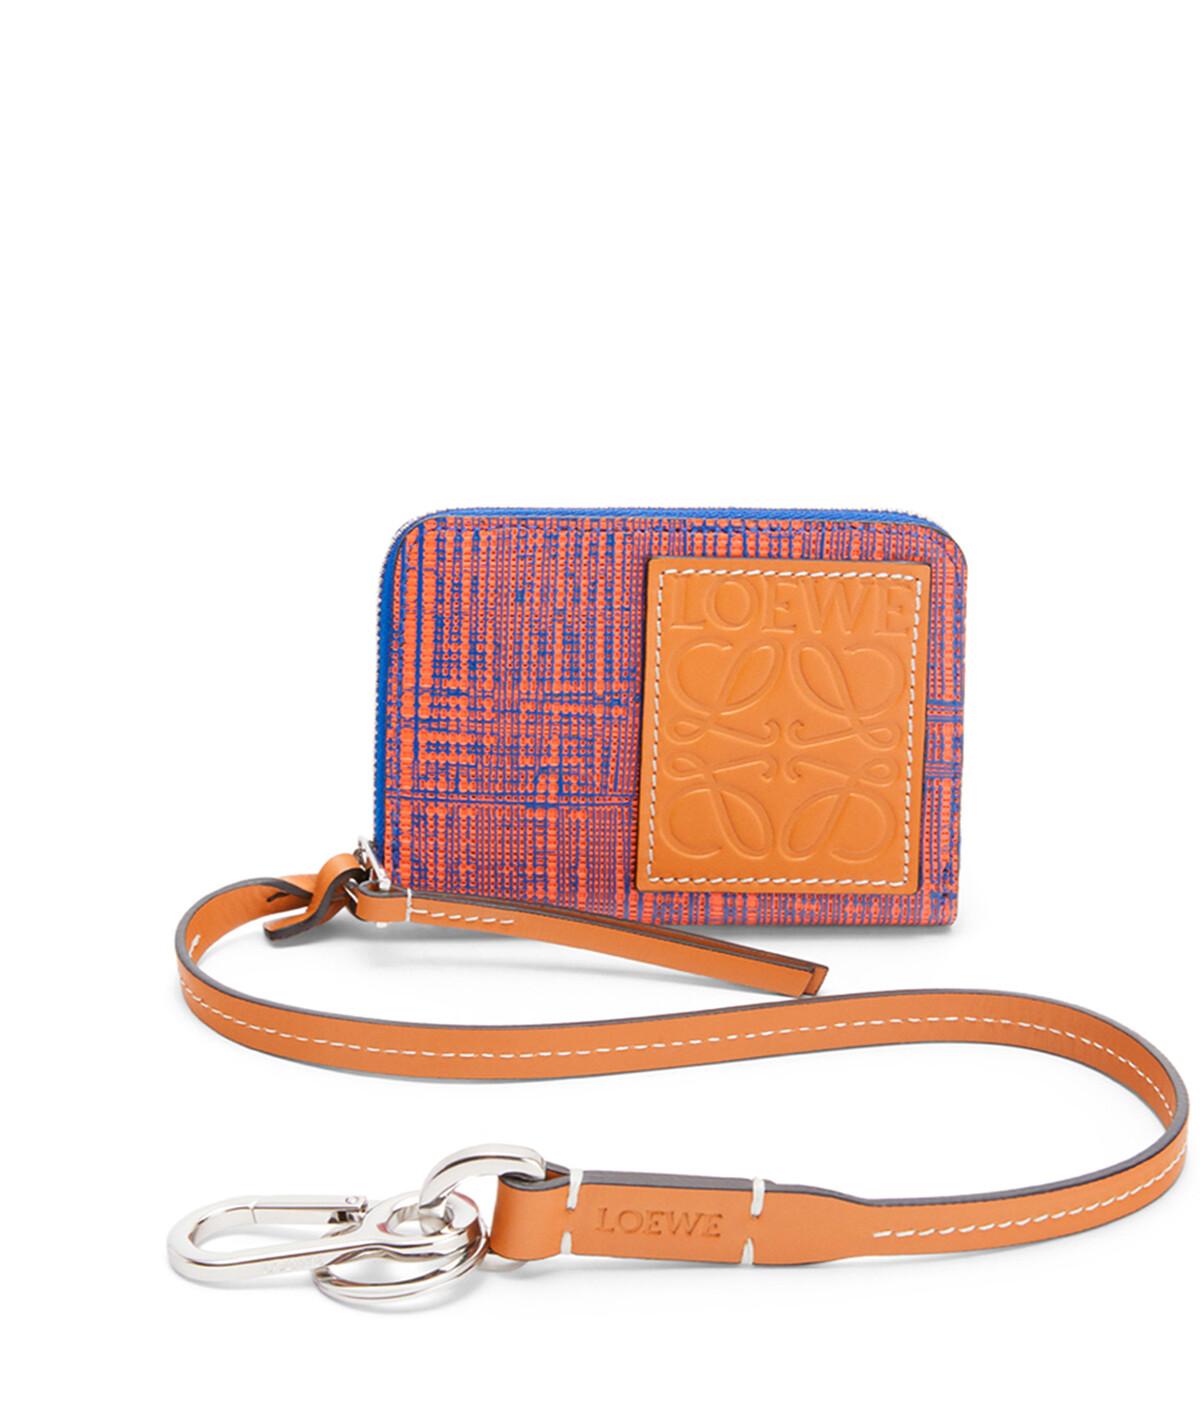 LOEWE Strap 6 Cards Wallet Electric Blue/Orange front